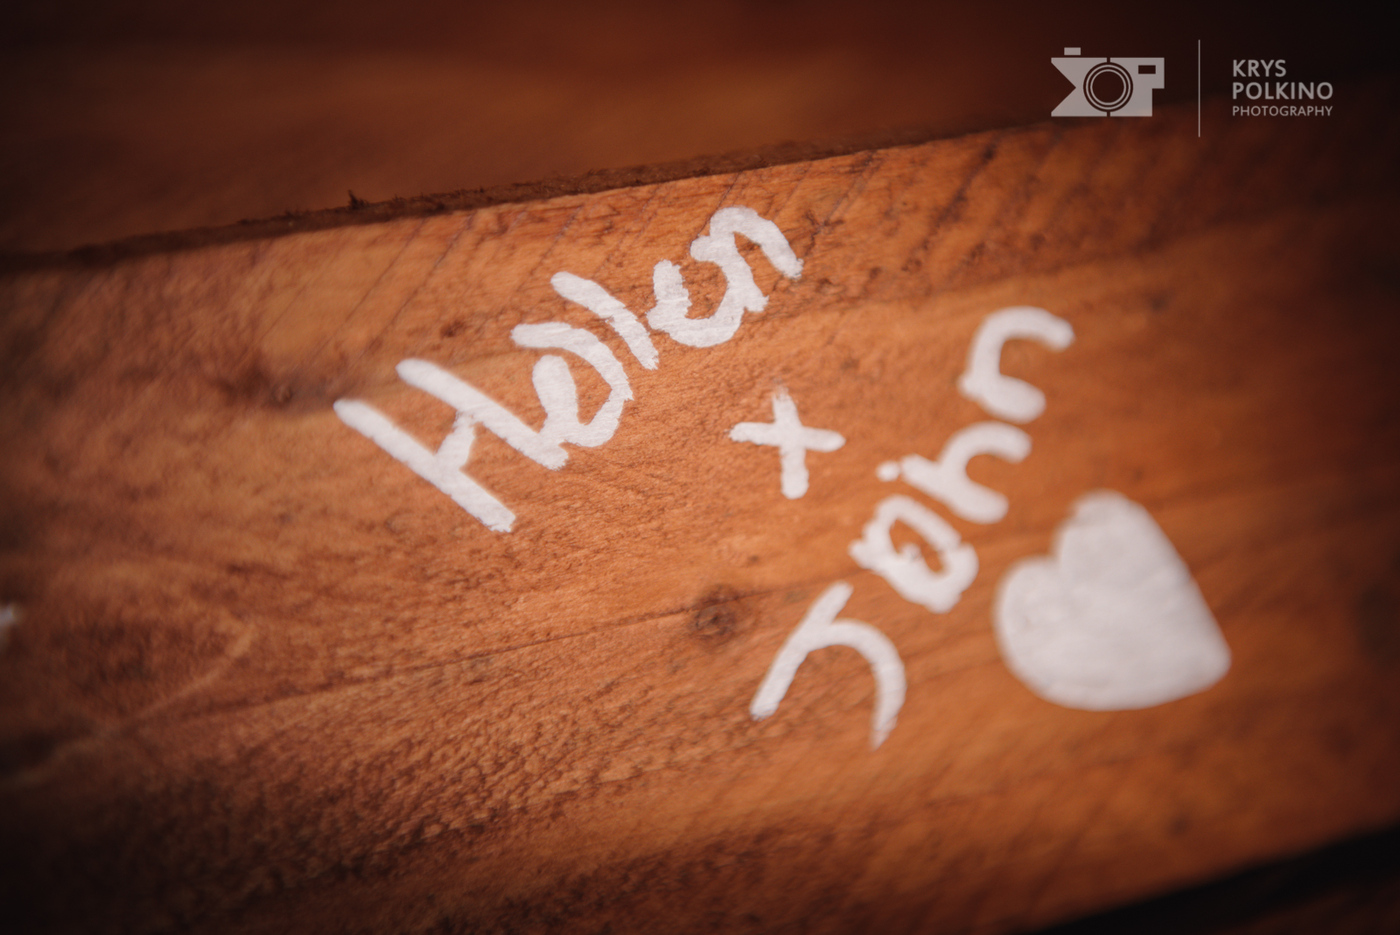 Helen & John | Wedding Photography at Social Club